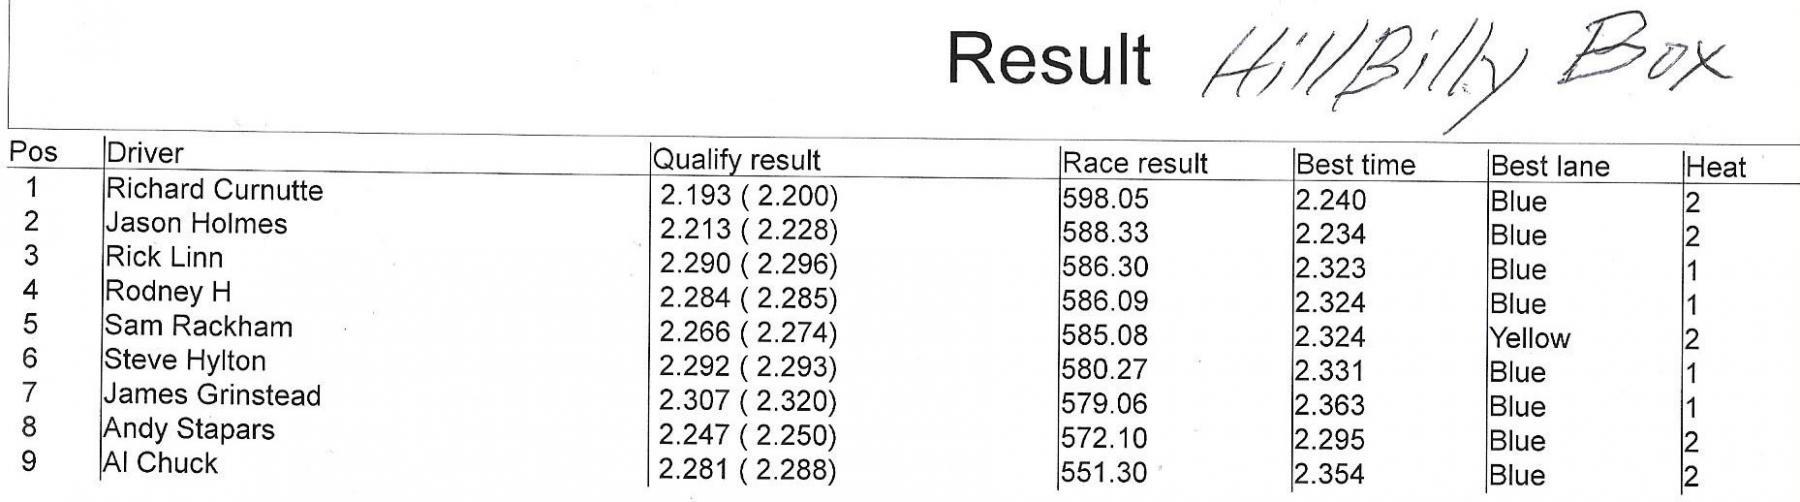 3720 hbb results.jpeg